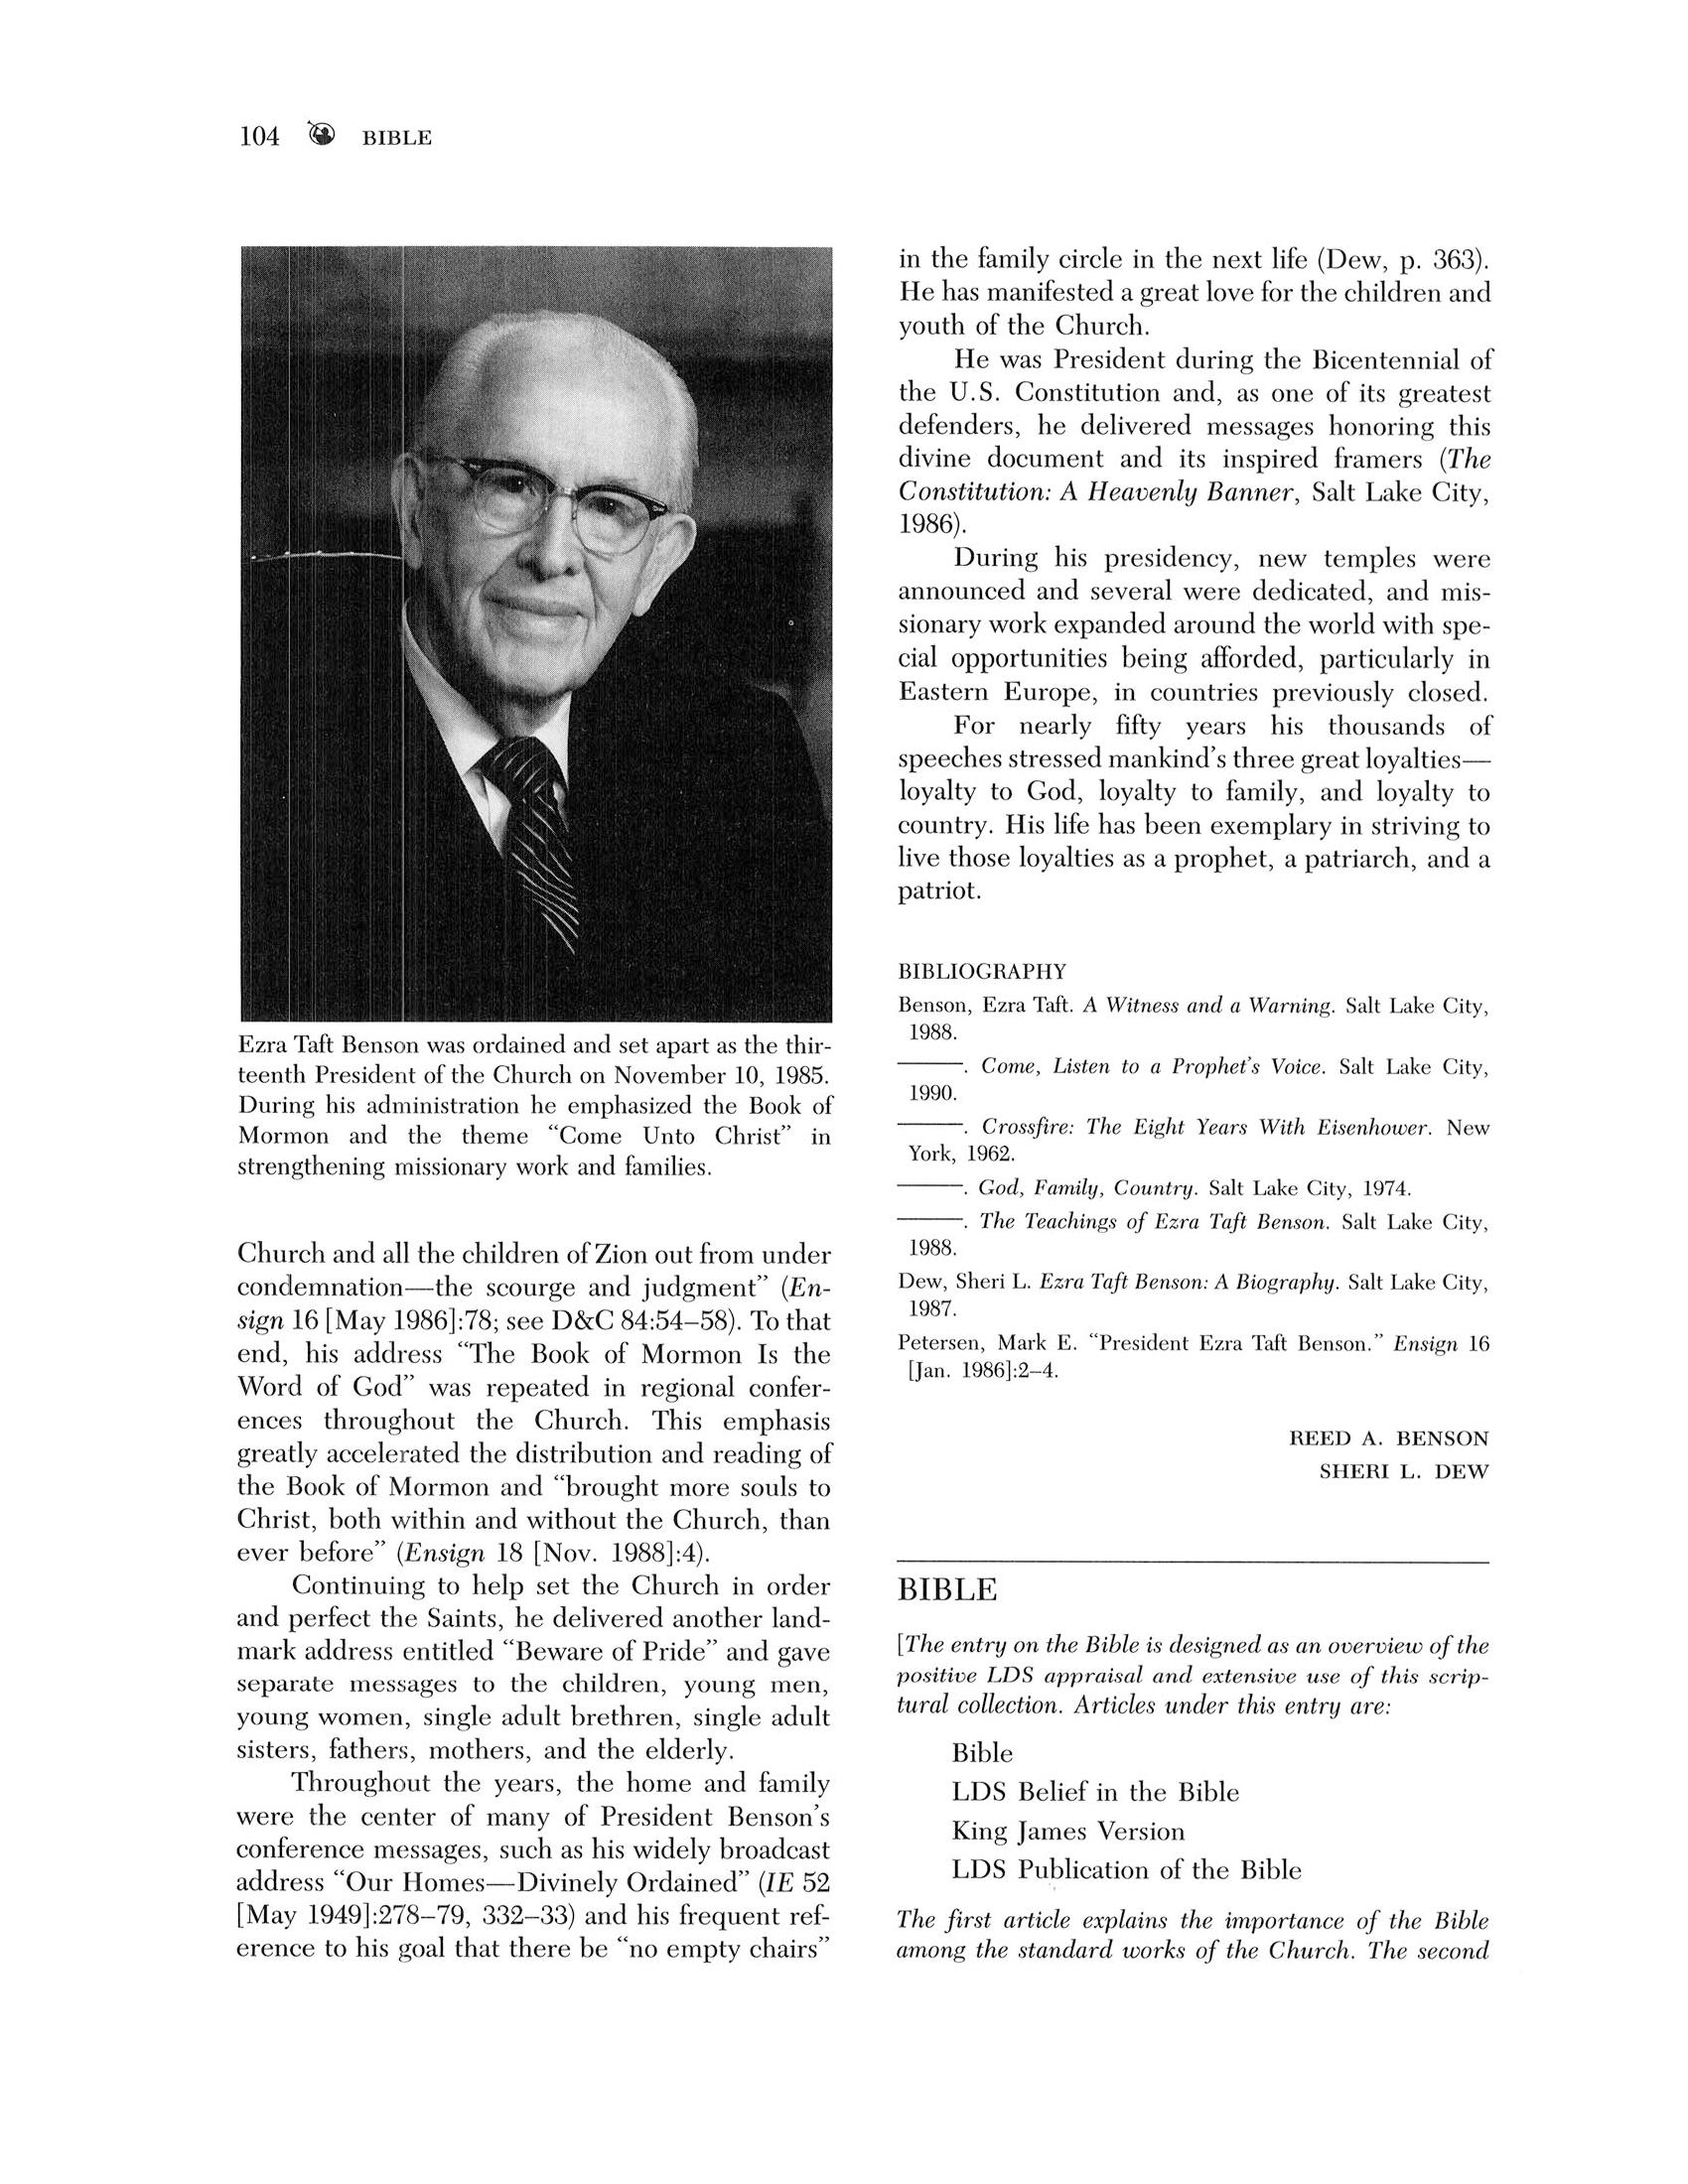 Bible - Encyclopedia of Mormonism - Digital Collections